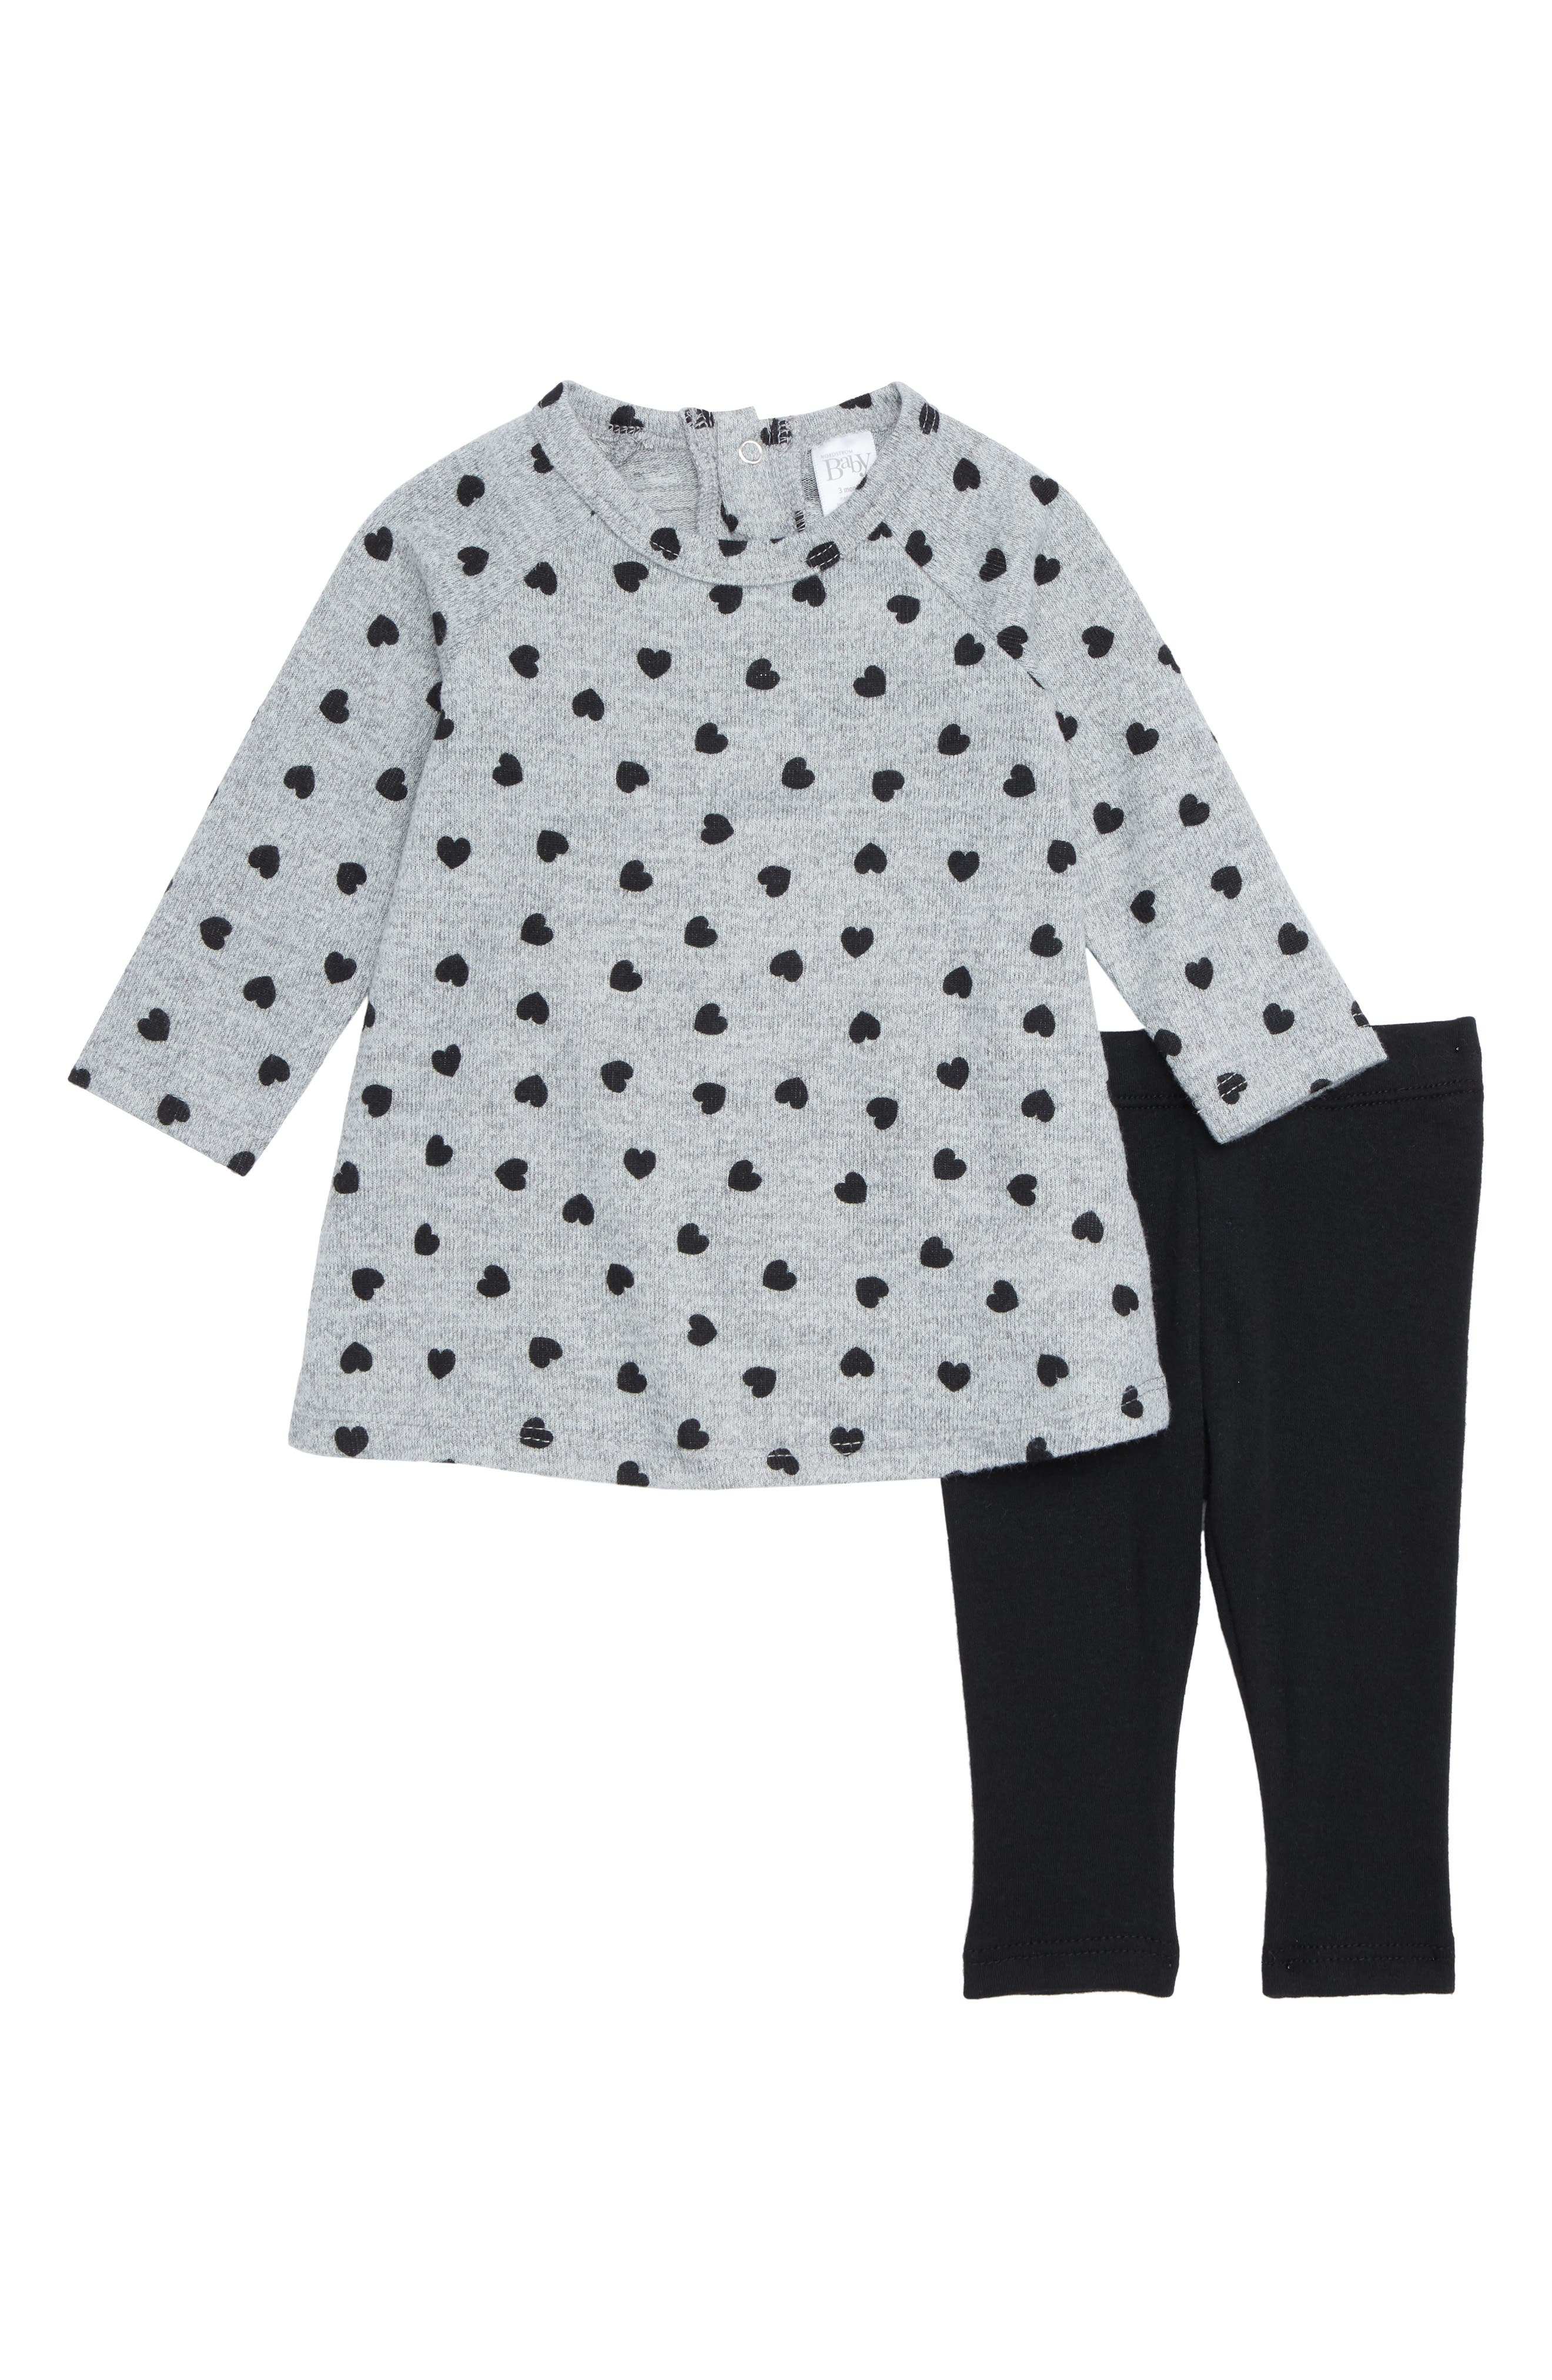 Tunic & Leggings Set,                         Main,                         color, GREY ASH HEATHER- BLACK HEARTS